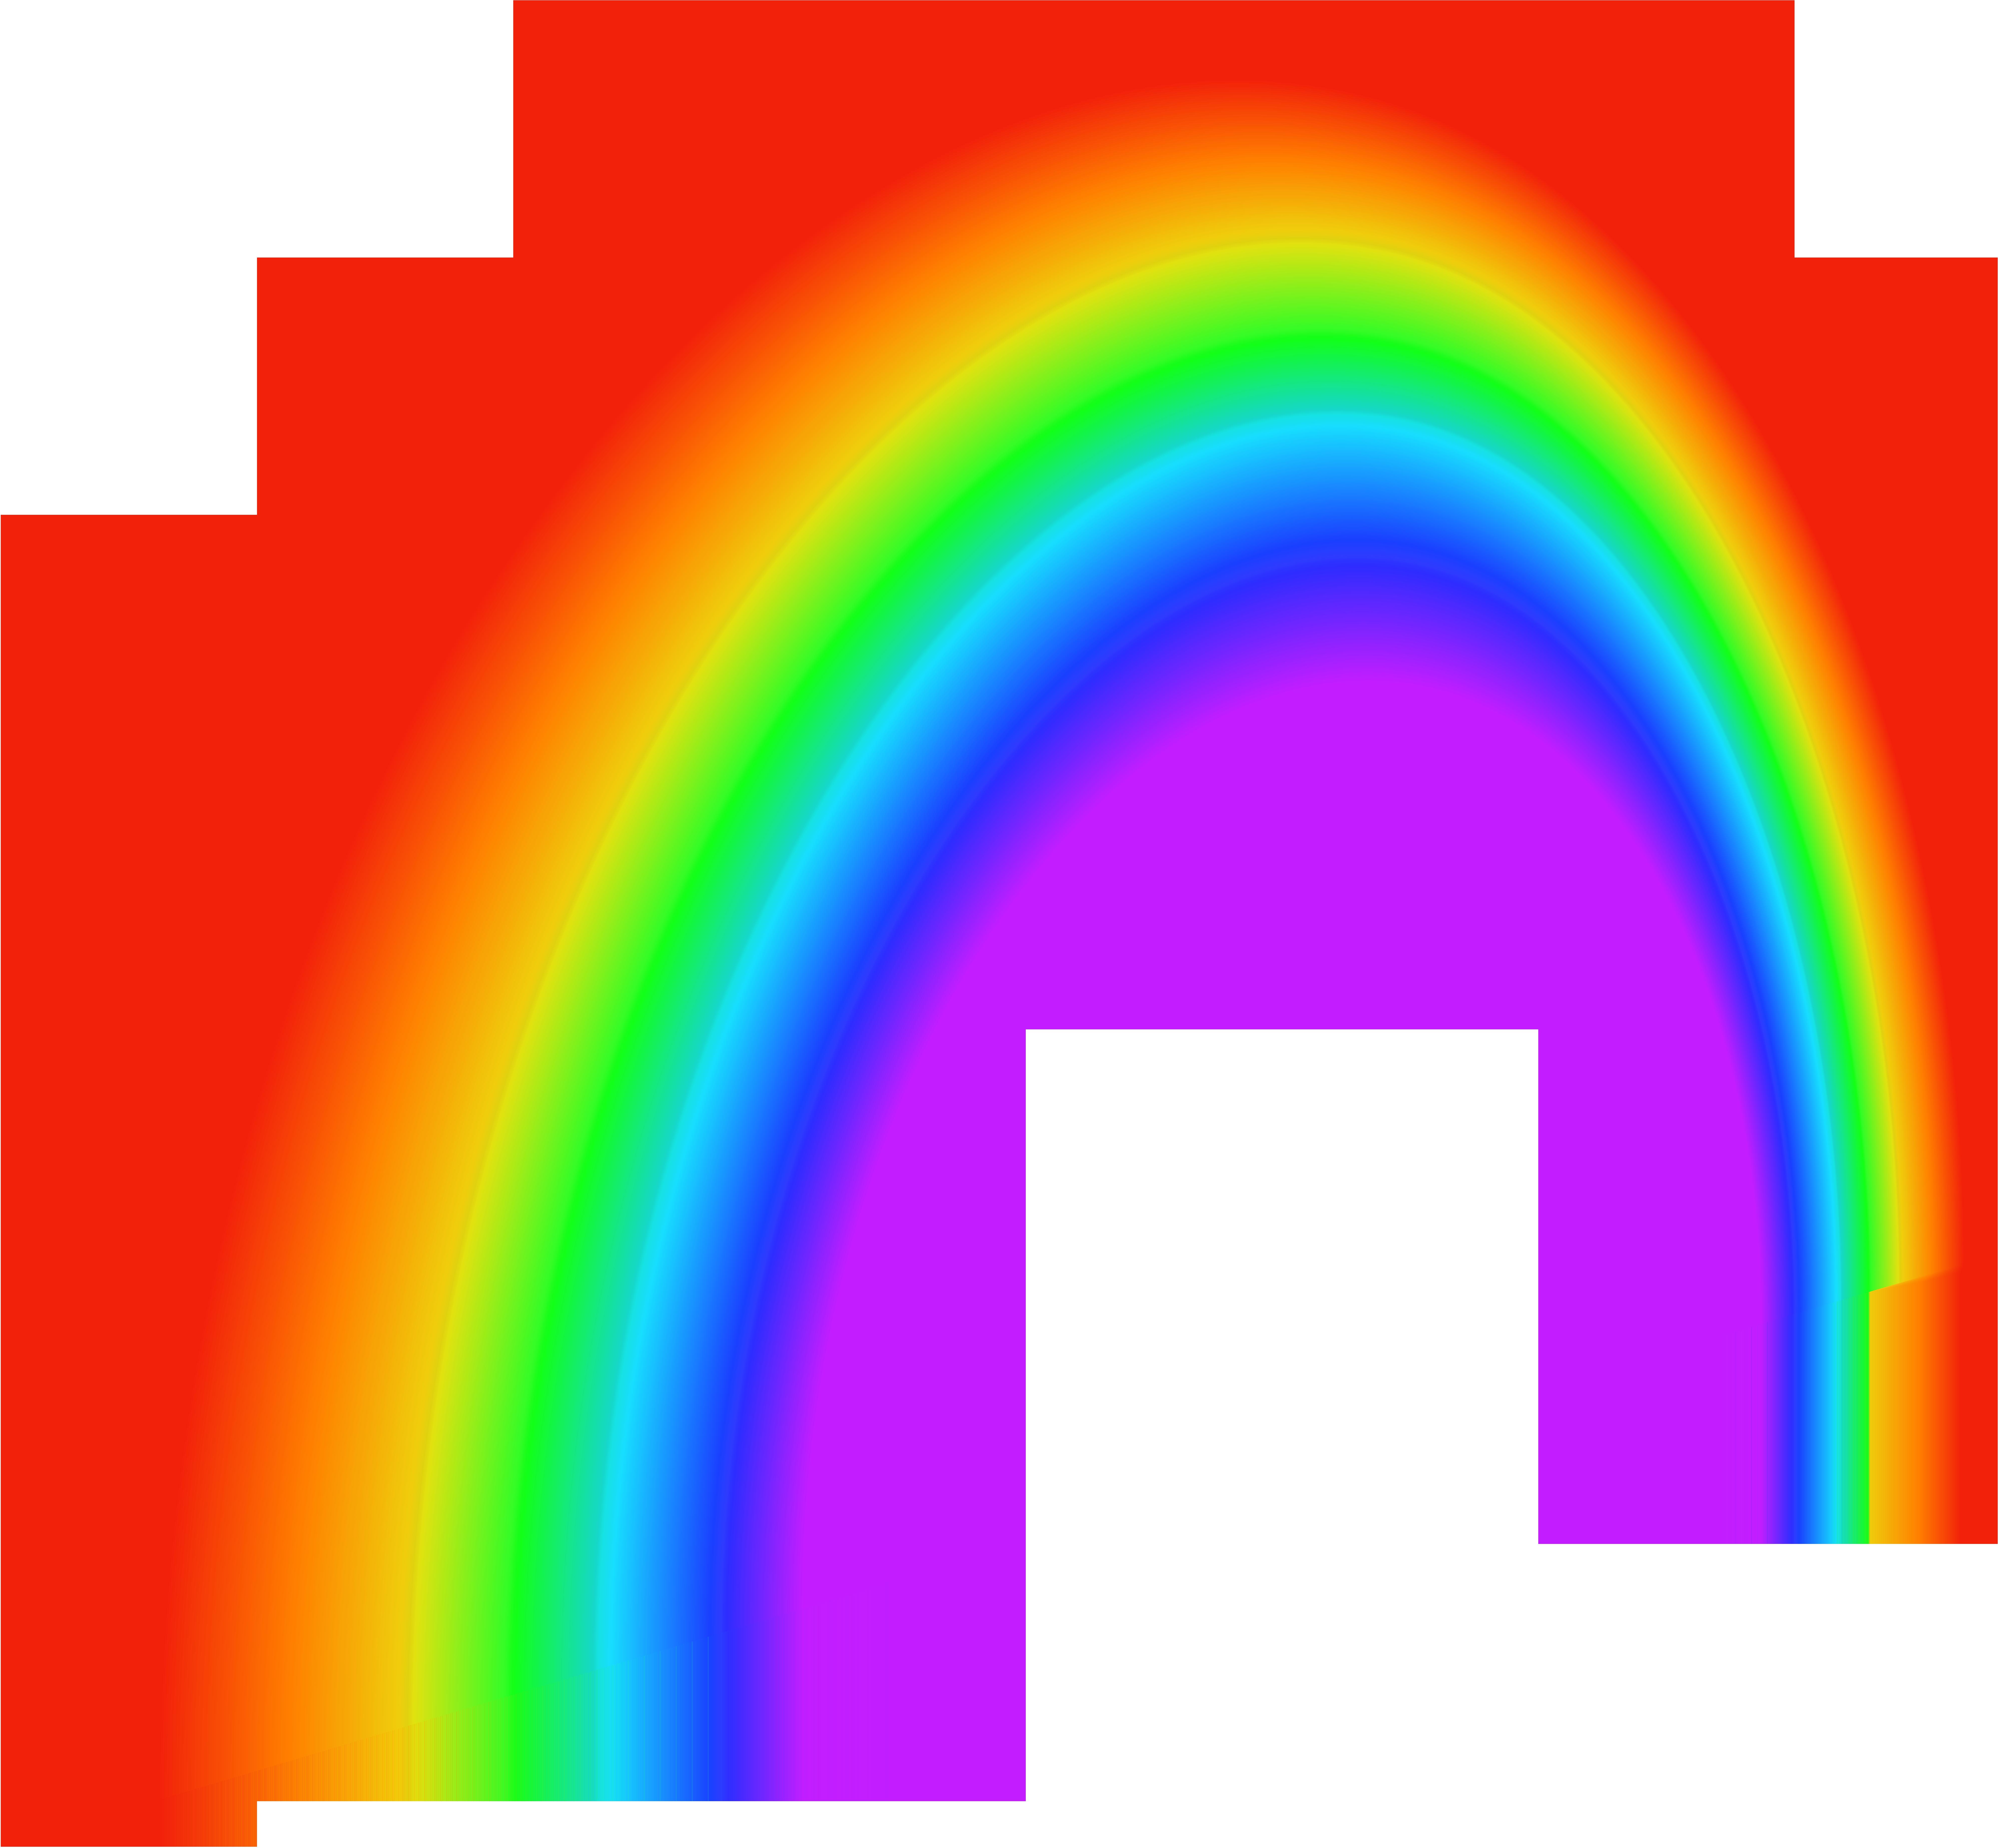 Rainbow PNG Free Clip Art Image.